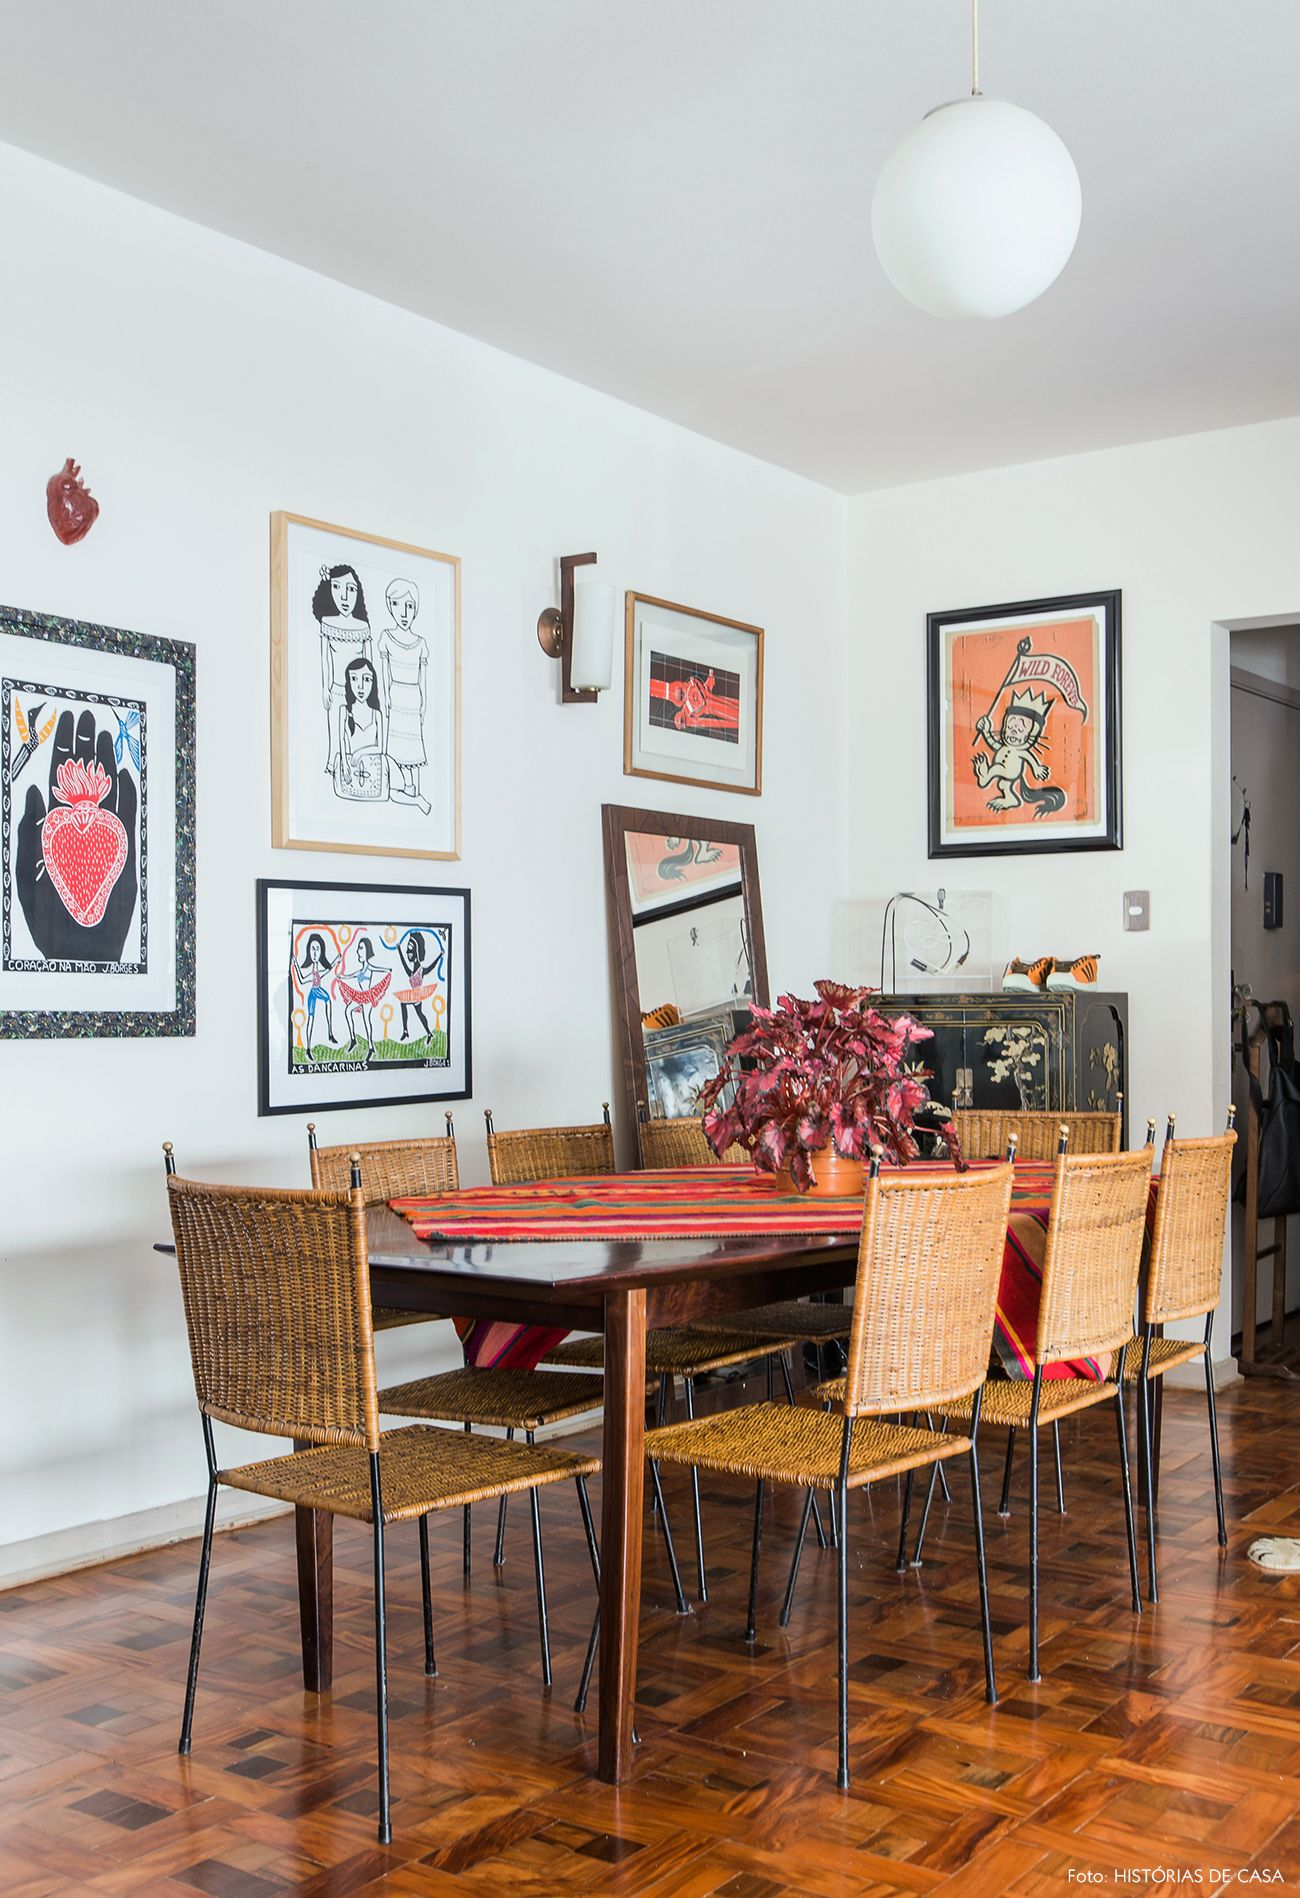 Tesouros Vintage Bohemian D Cor Room And Decorating -> Parede Galeria Sala